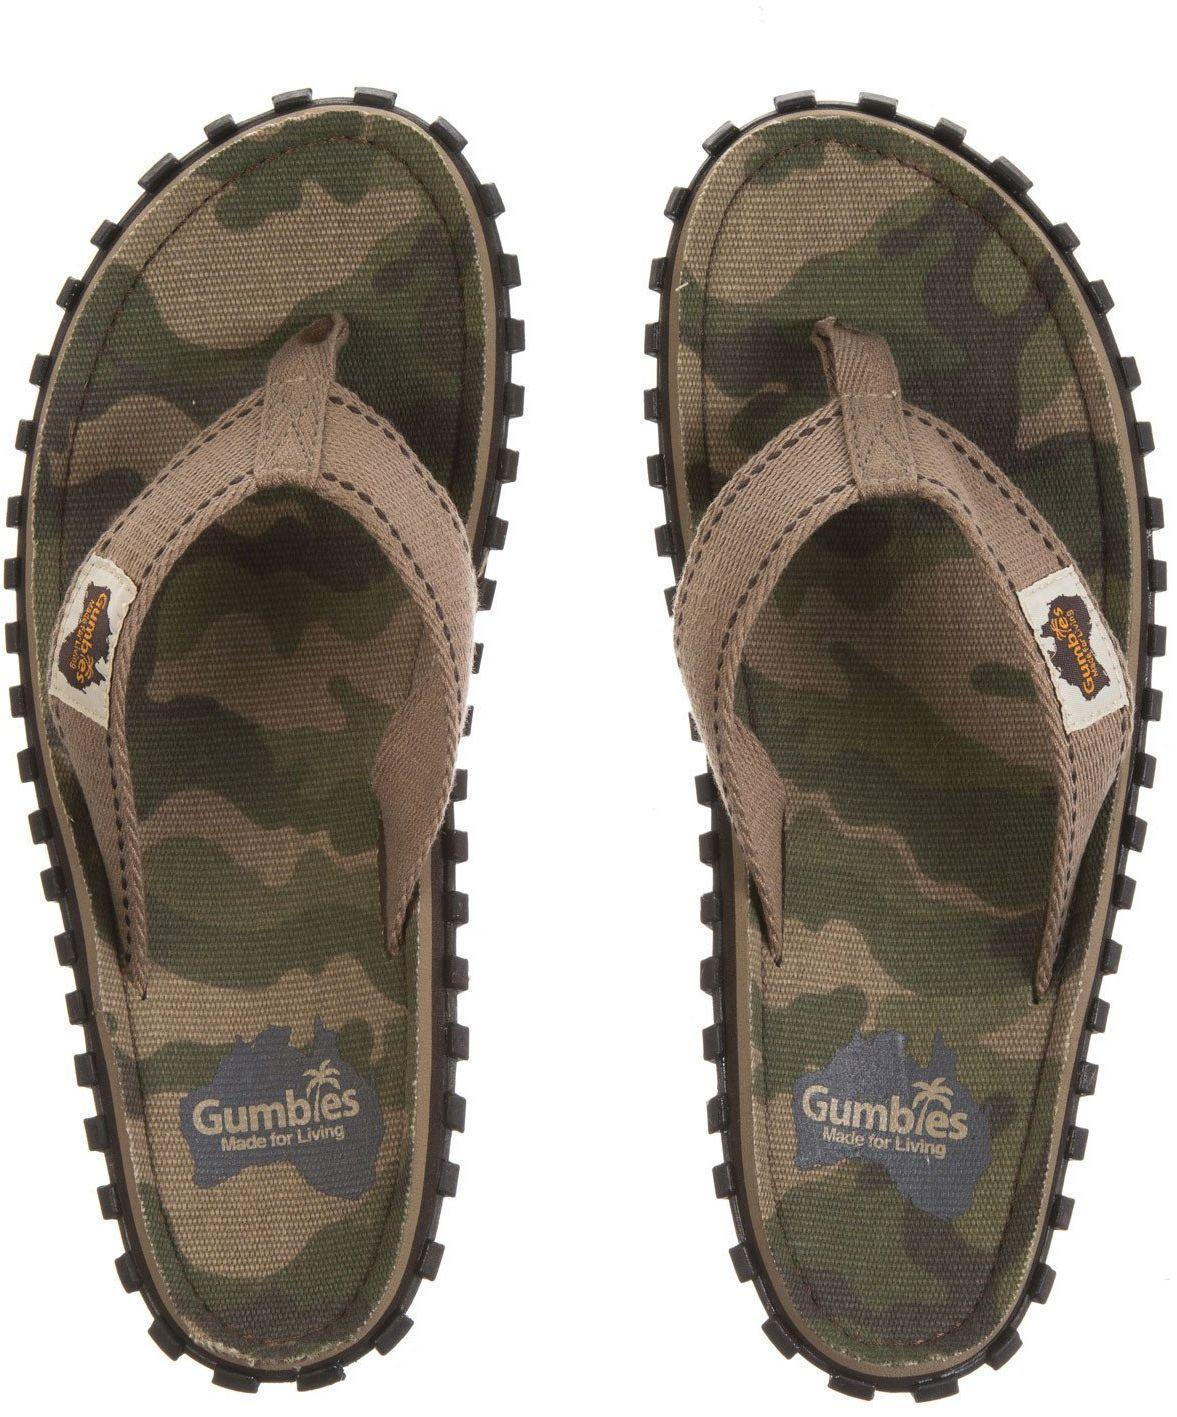 Gumbies Japonki meskie Islander Canvas Flip-Flops Men Camouflage r. 41 4009287